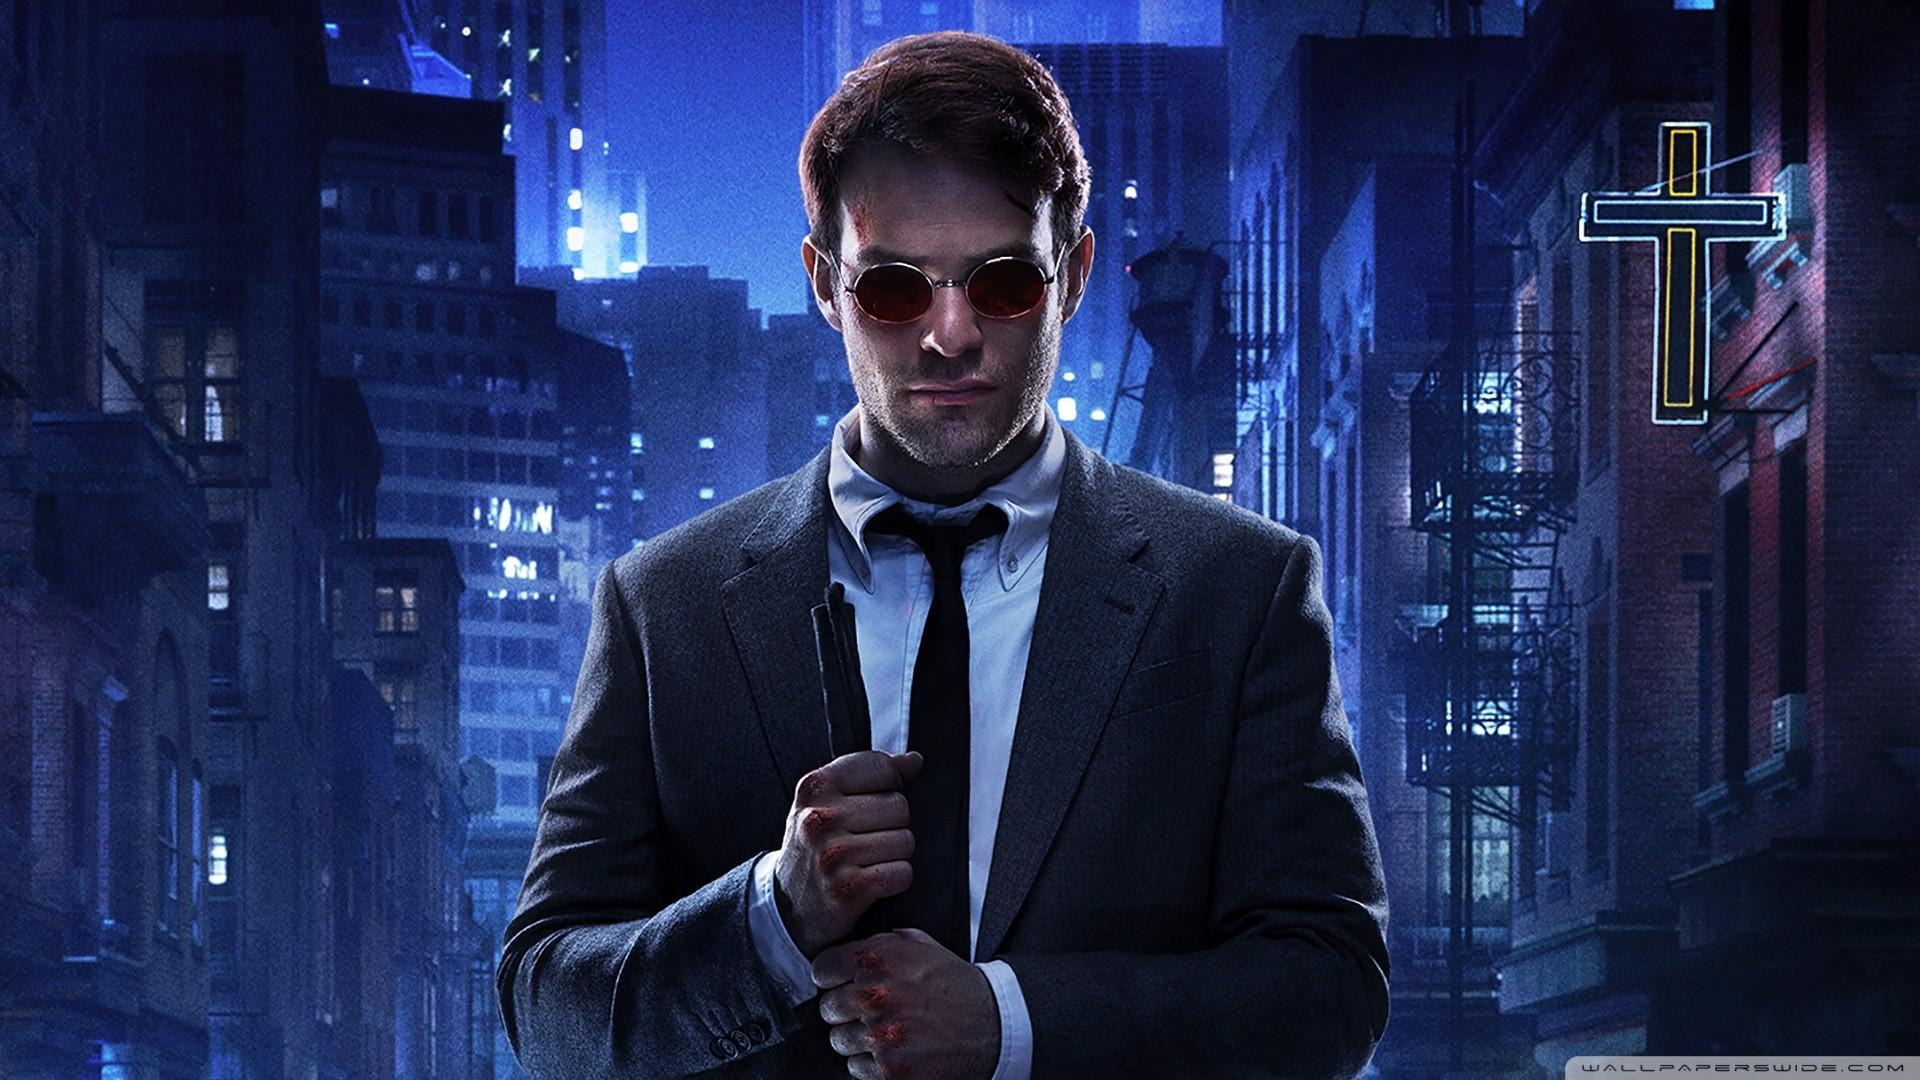 7-dark-superhero-series-to-watch-during-social-distancing-2